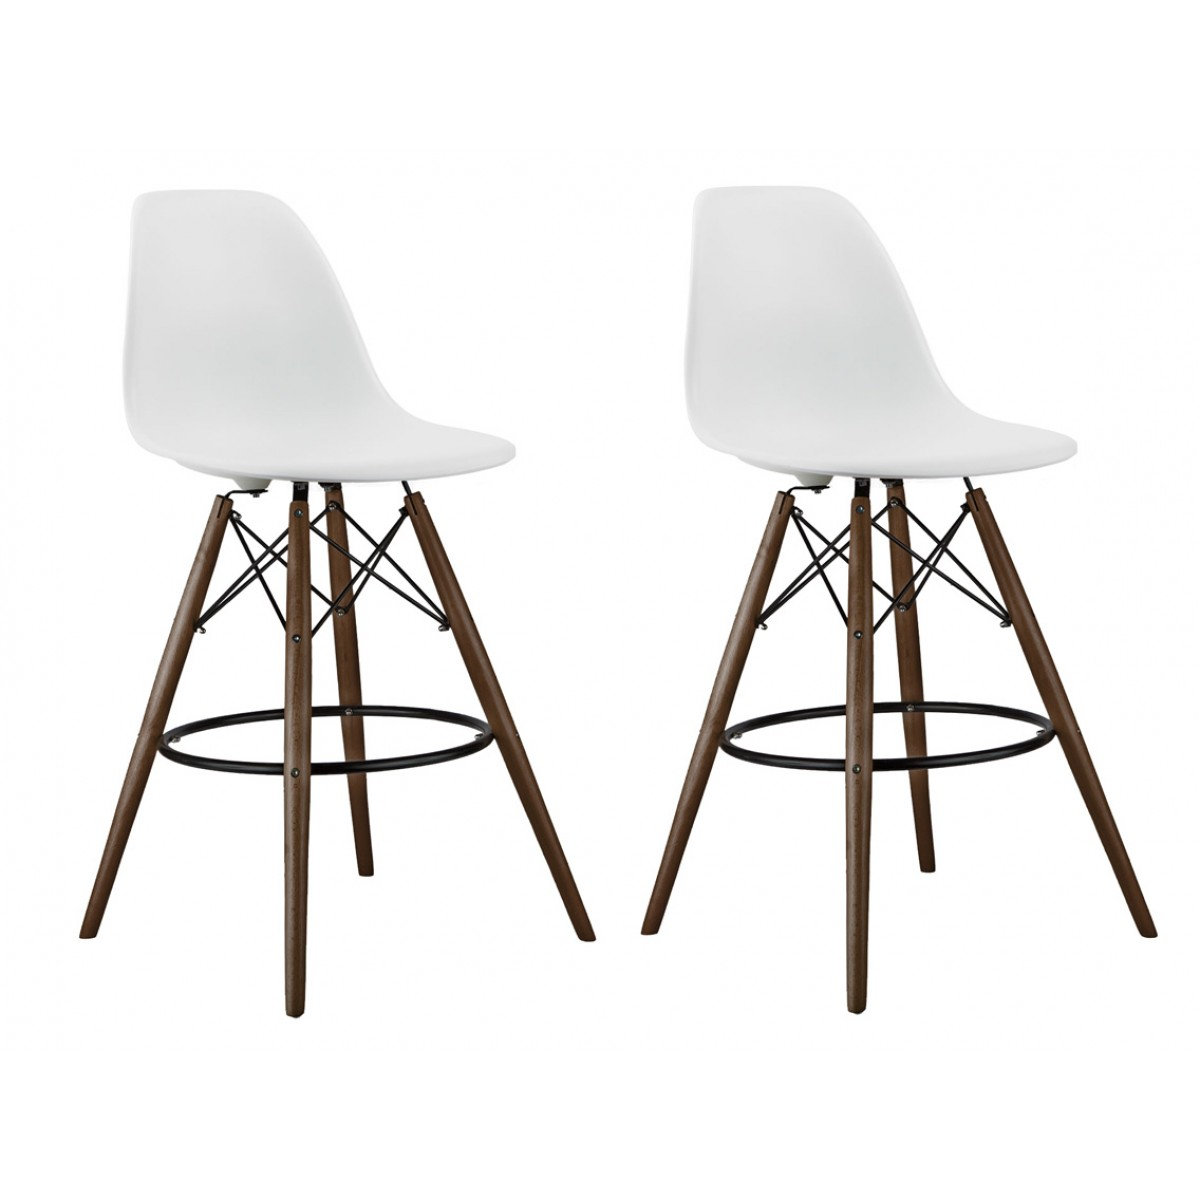 Set of 2 White Eames Style DSW Stool with Dark Walnut Wood  : eames stools white walnut leg 65 2p1 from www.emoderndecor.com size 1200 x 1200 jpeg 95kB